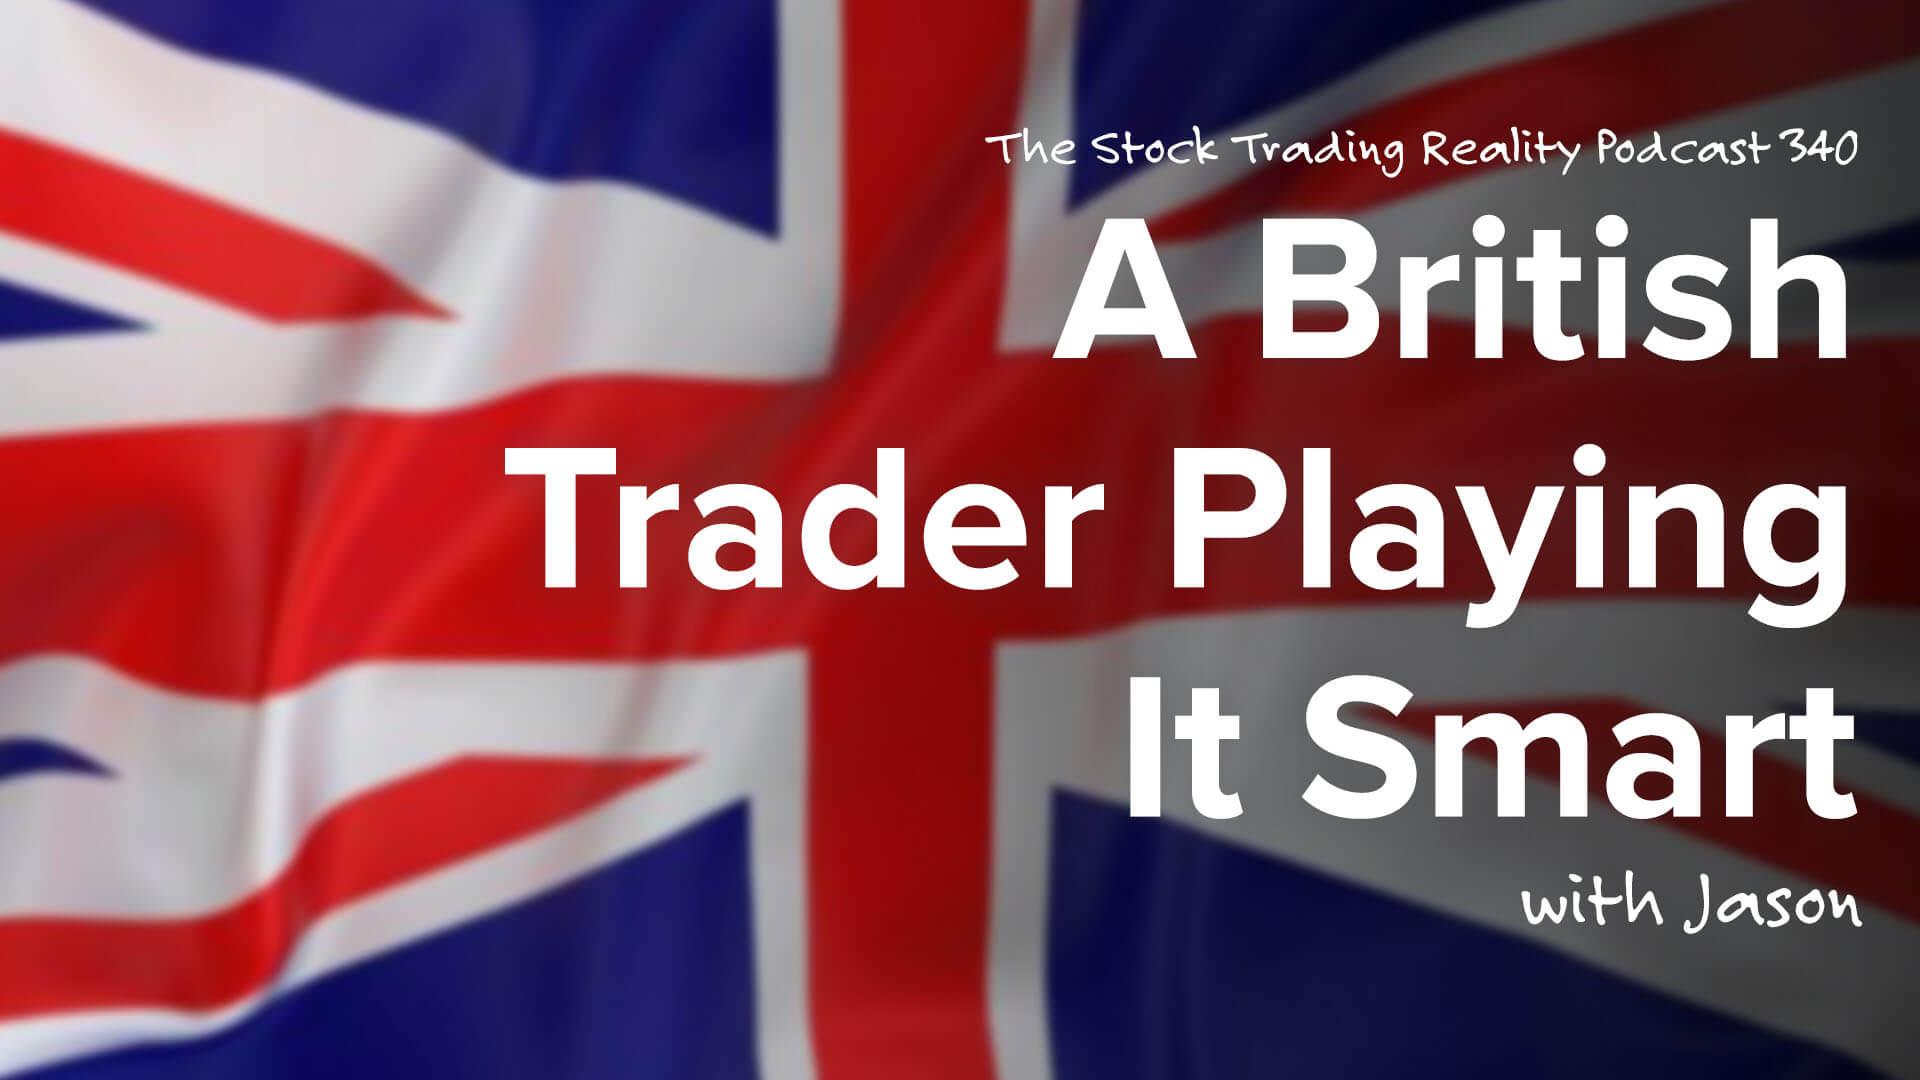 A British Trader Playing It Smart   STR 340